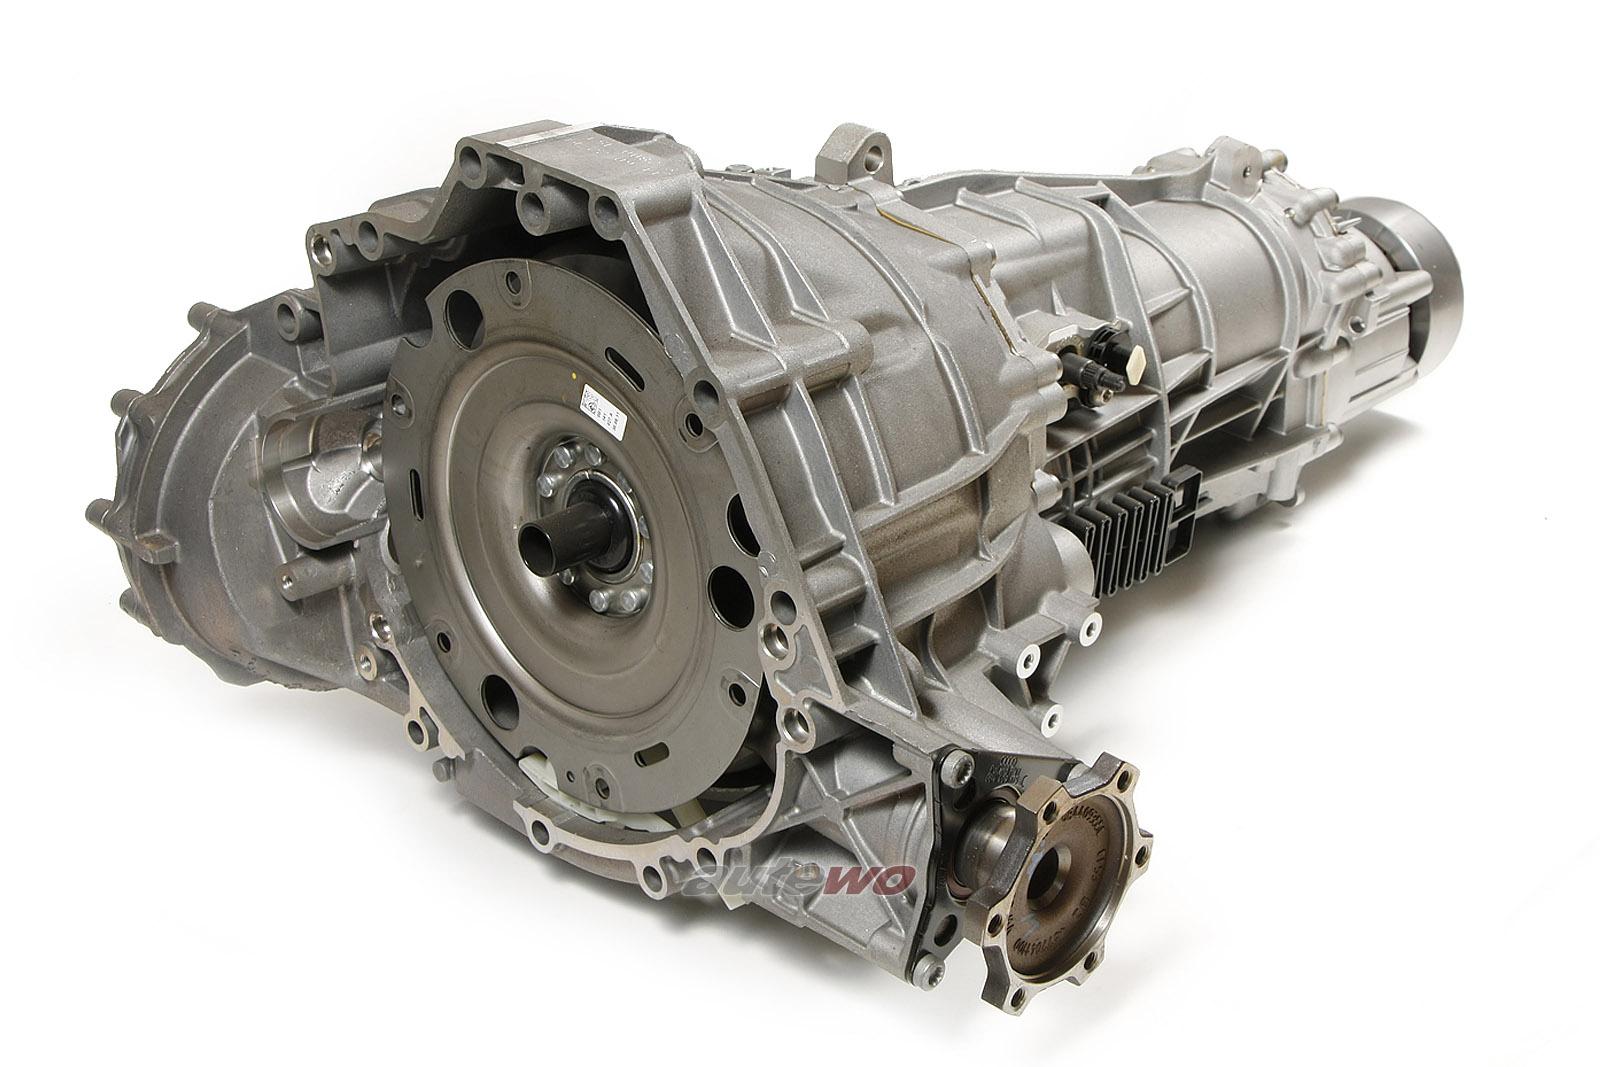 0B2300028L 0B2300042N NEU Audi A4 8K Allroad 2.0l 6-Gang-Getriebe Quattro LSE